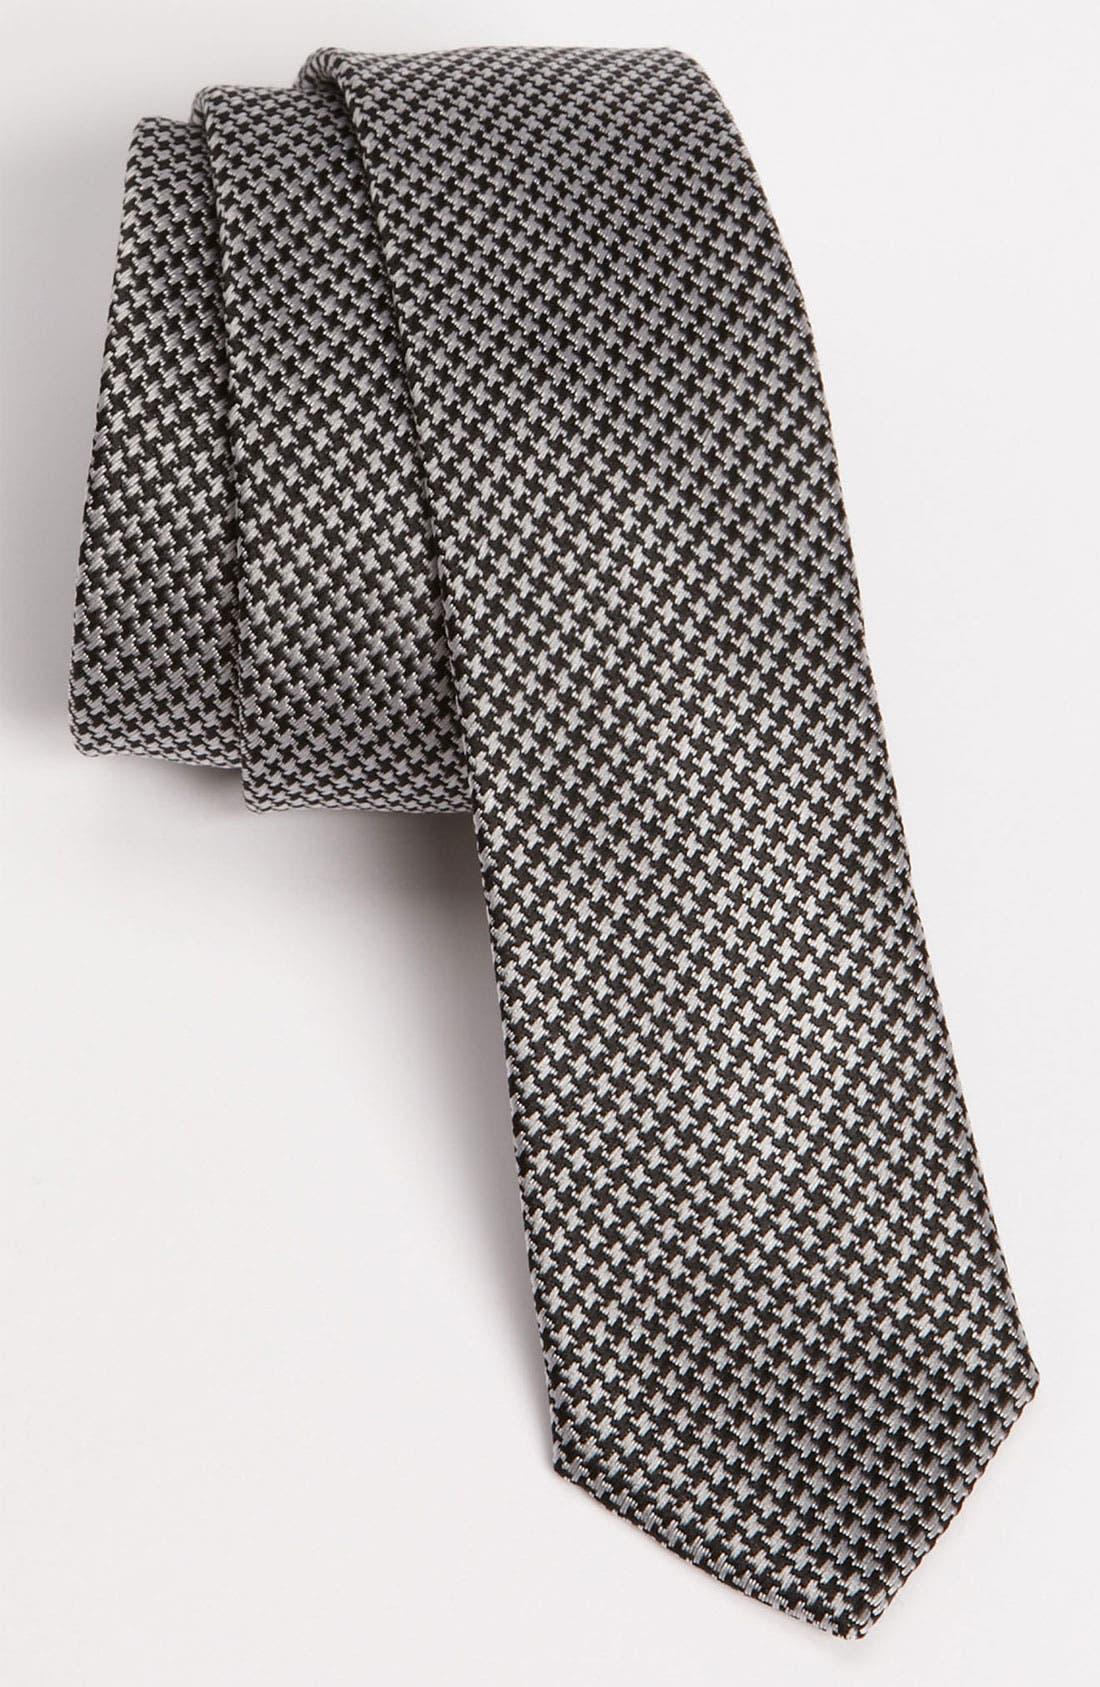 Alternate Image 1 Selected - Topman Skinny Houndstooth Woven Tie